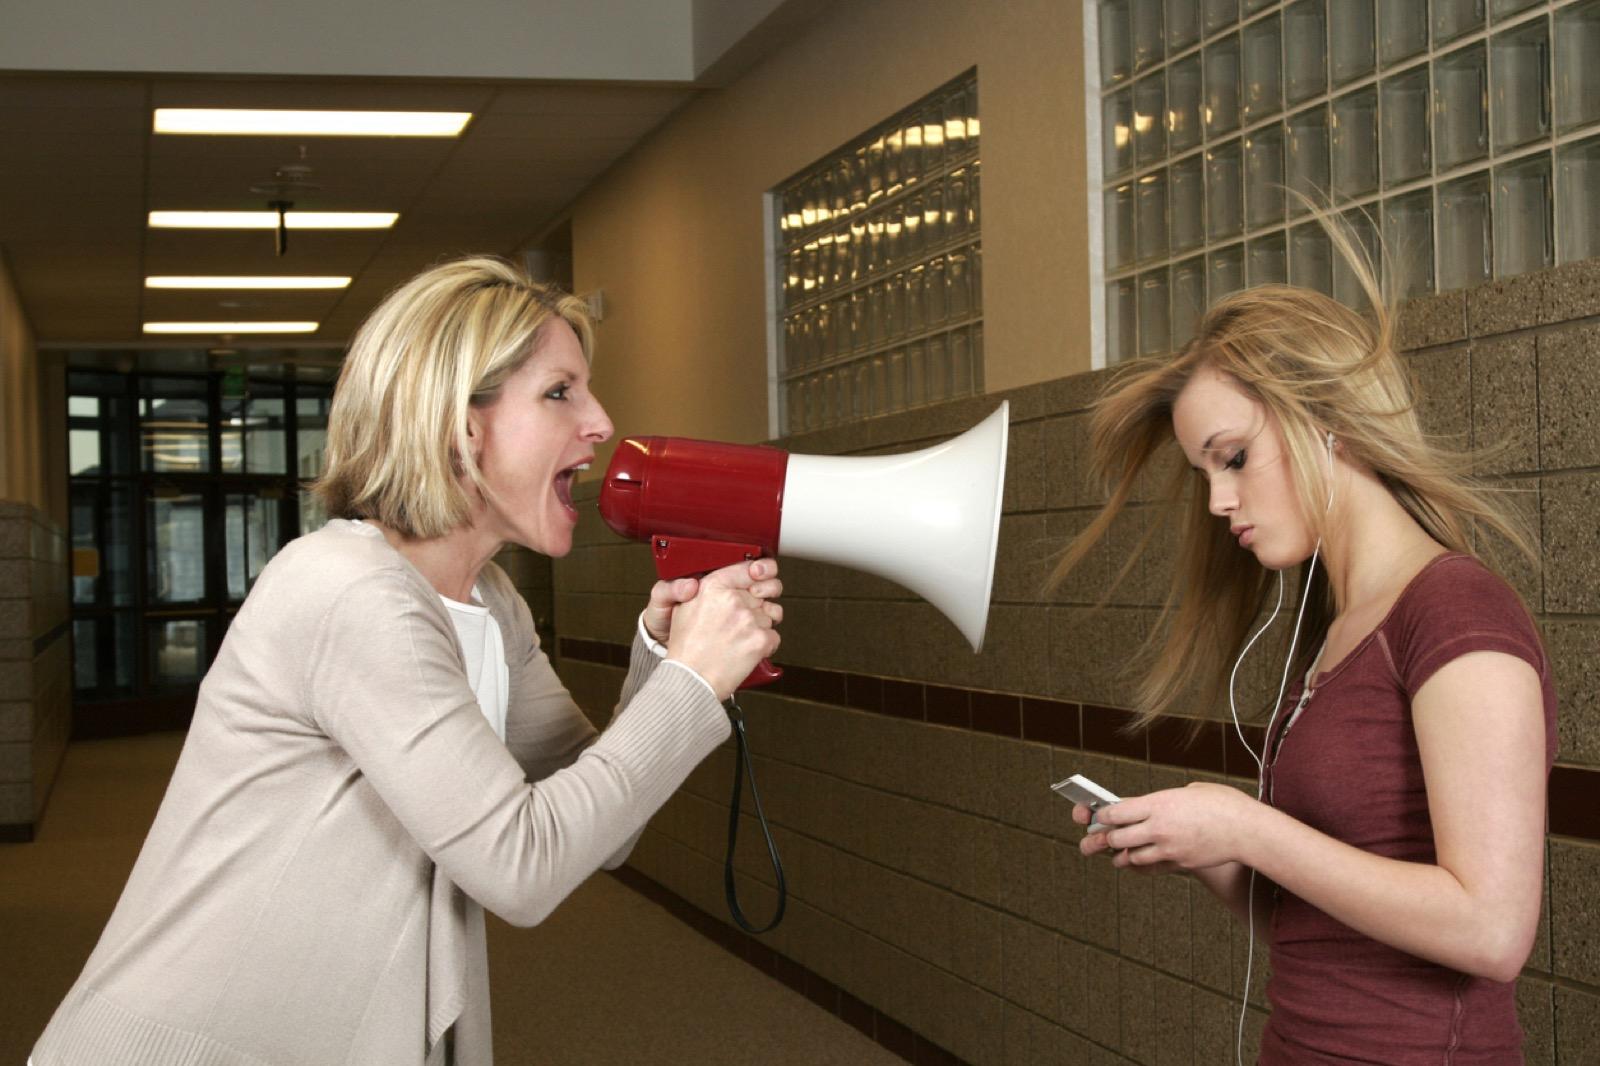 Woman-yelling-through-a-bullhorn-at-an-unfazed-teenage-girl-172808685_1258x839 (1)_Web.jpeg